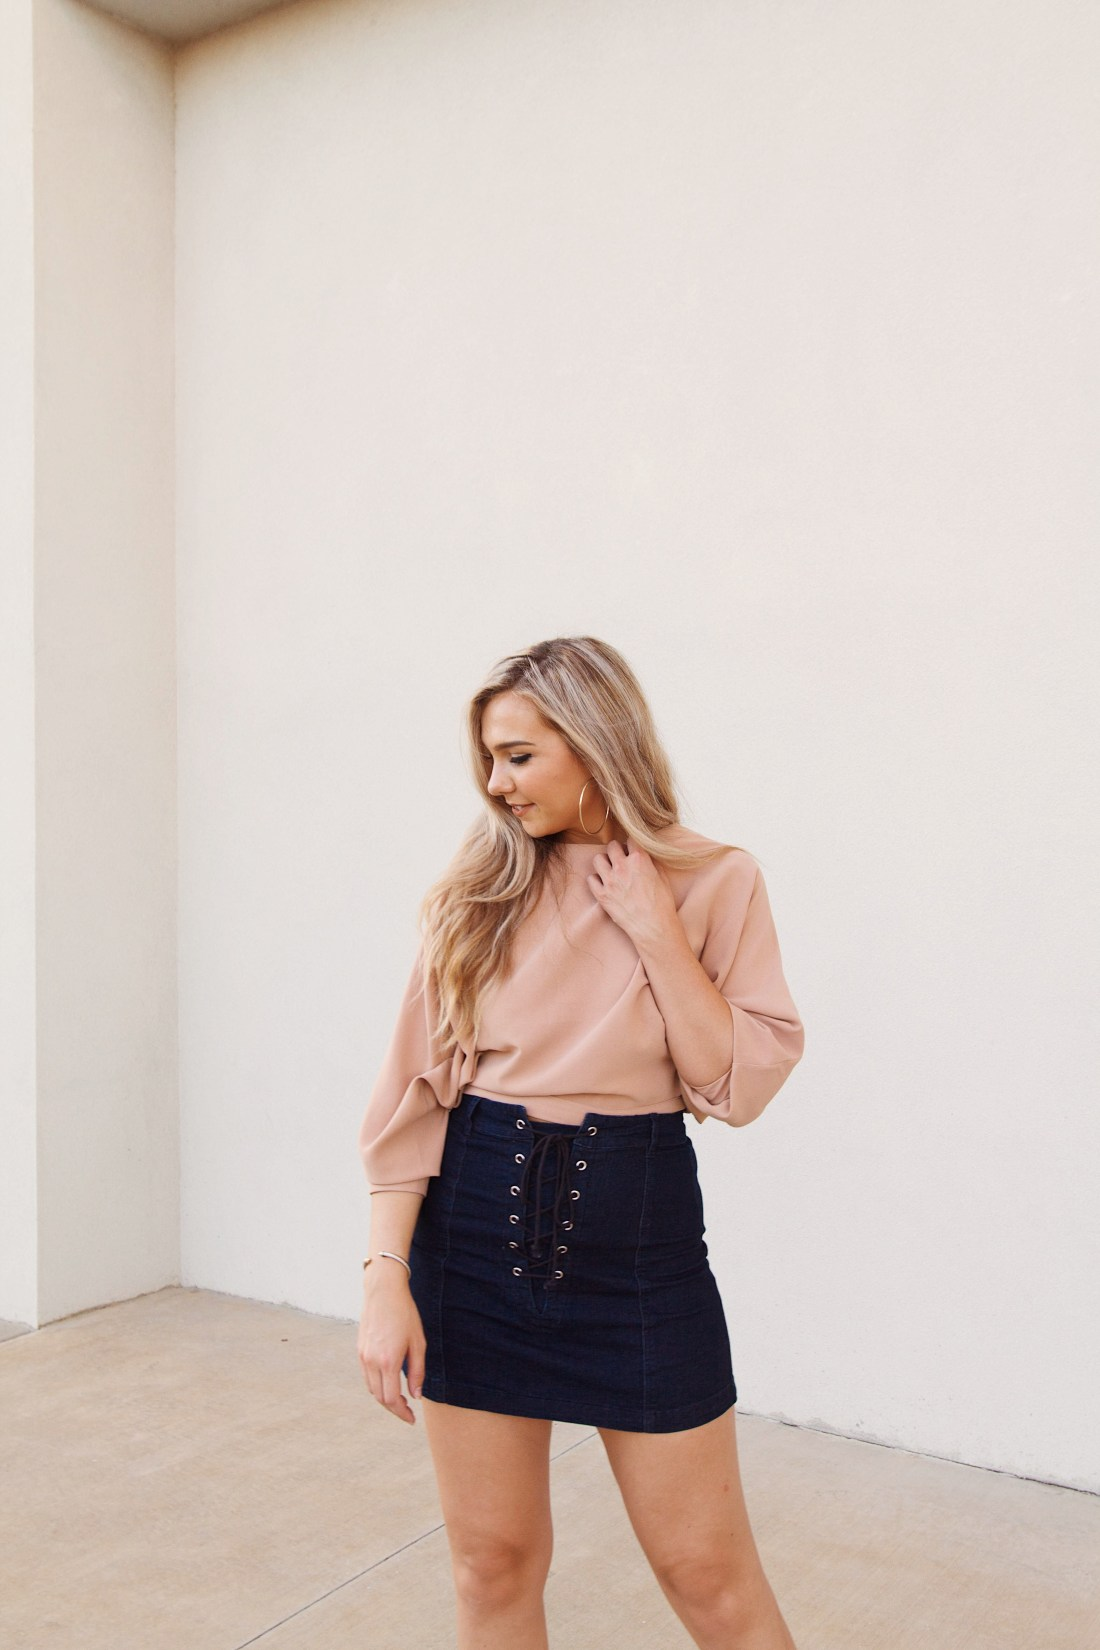 Milan Merlo Dallas Style Blogger Milan Darling Some Words of Encouragement: Keep Following your Dreams